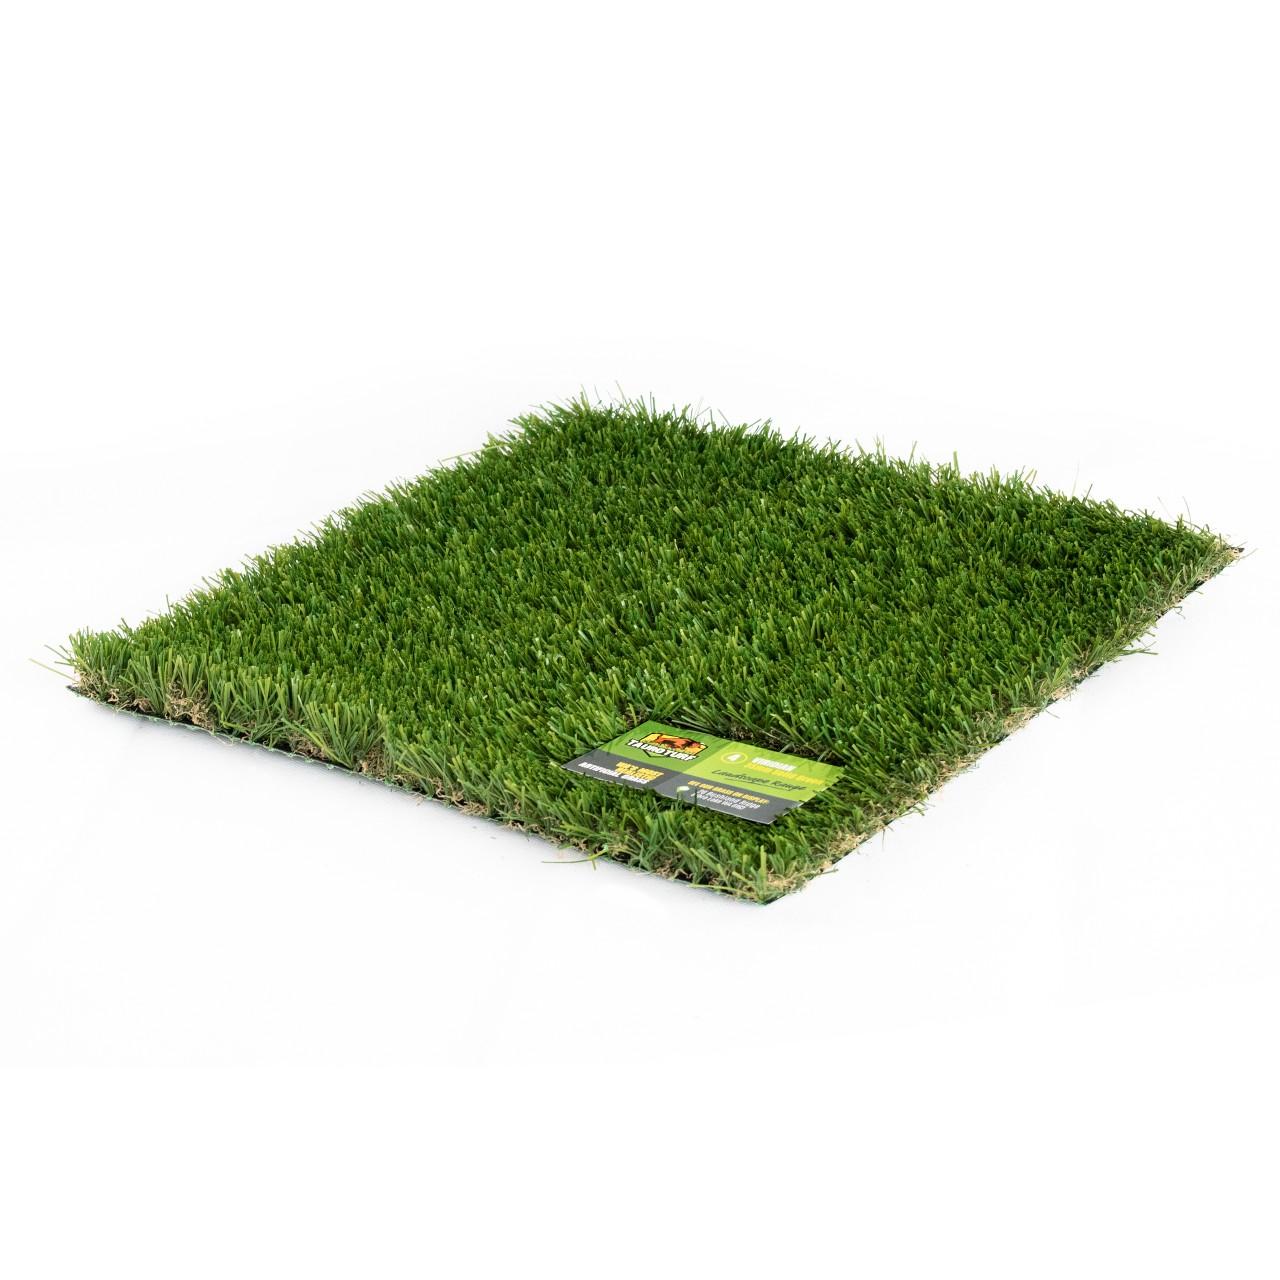 Viridan Grass image